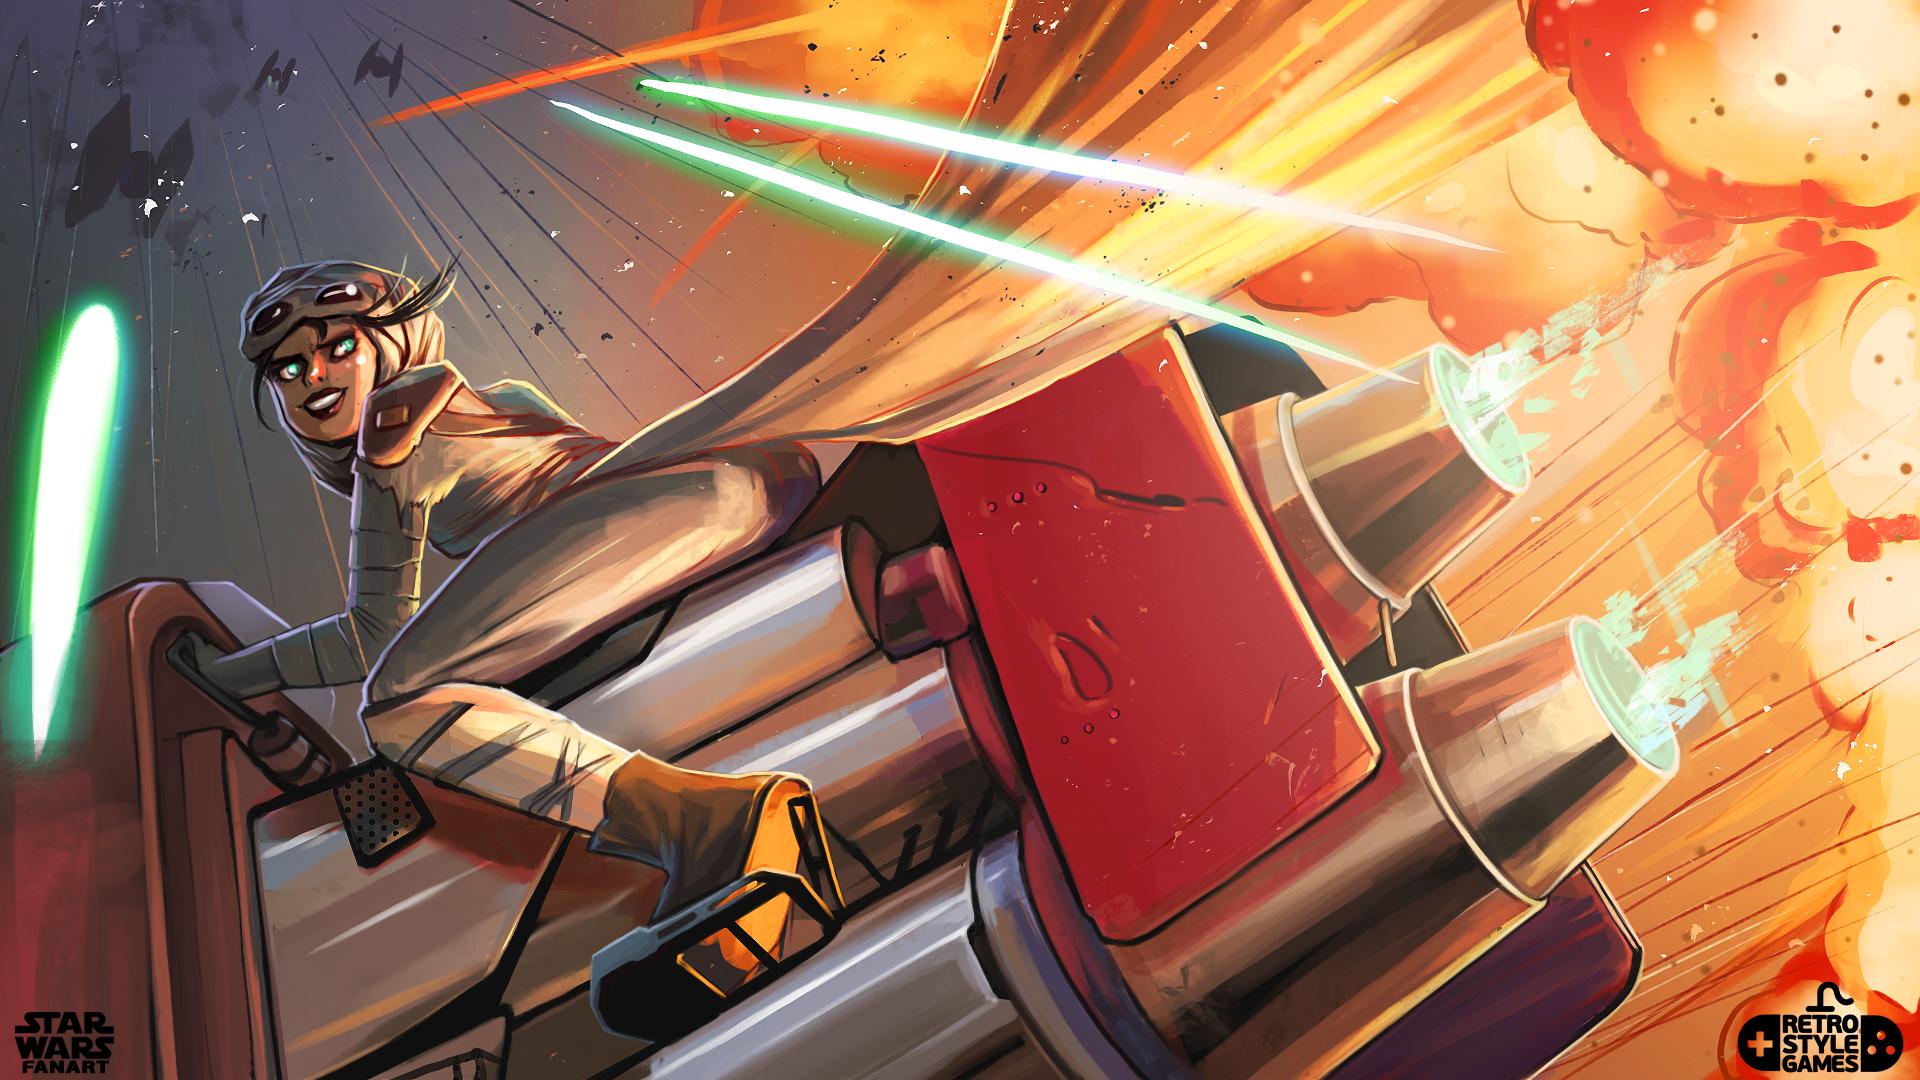 05-StarWars-Rey-character-chase-illustration